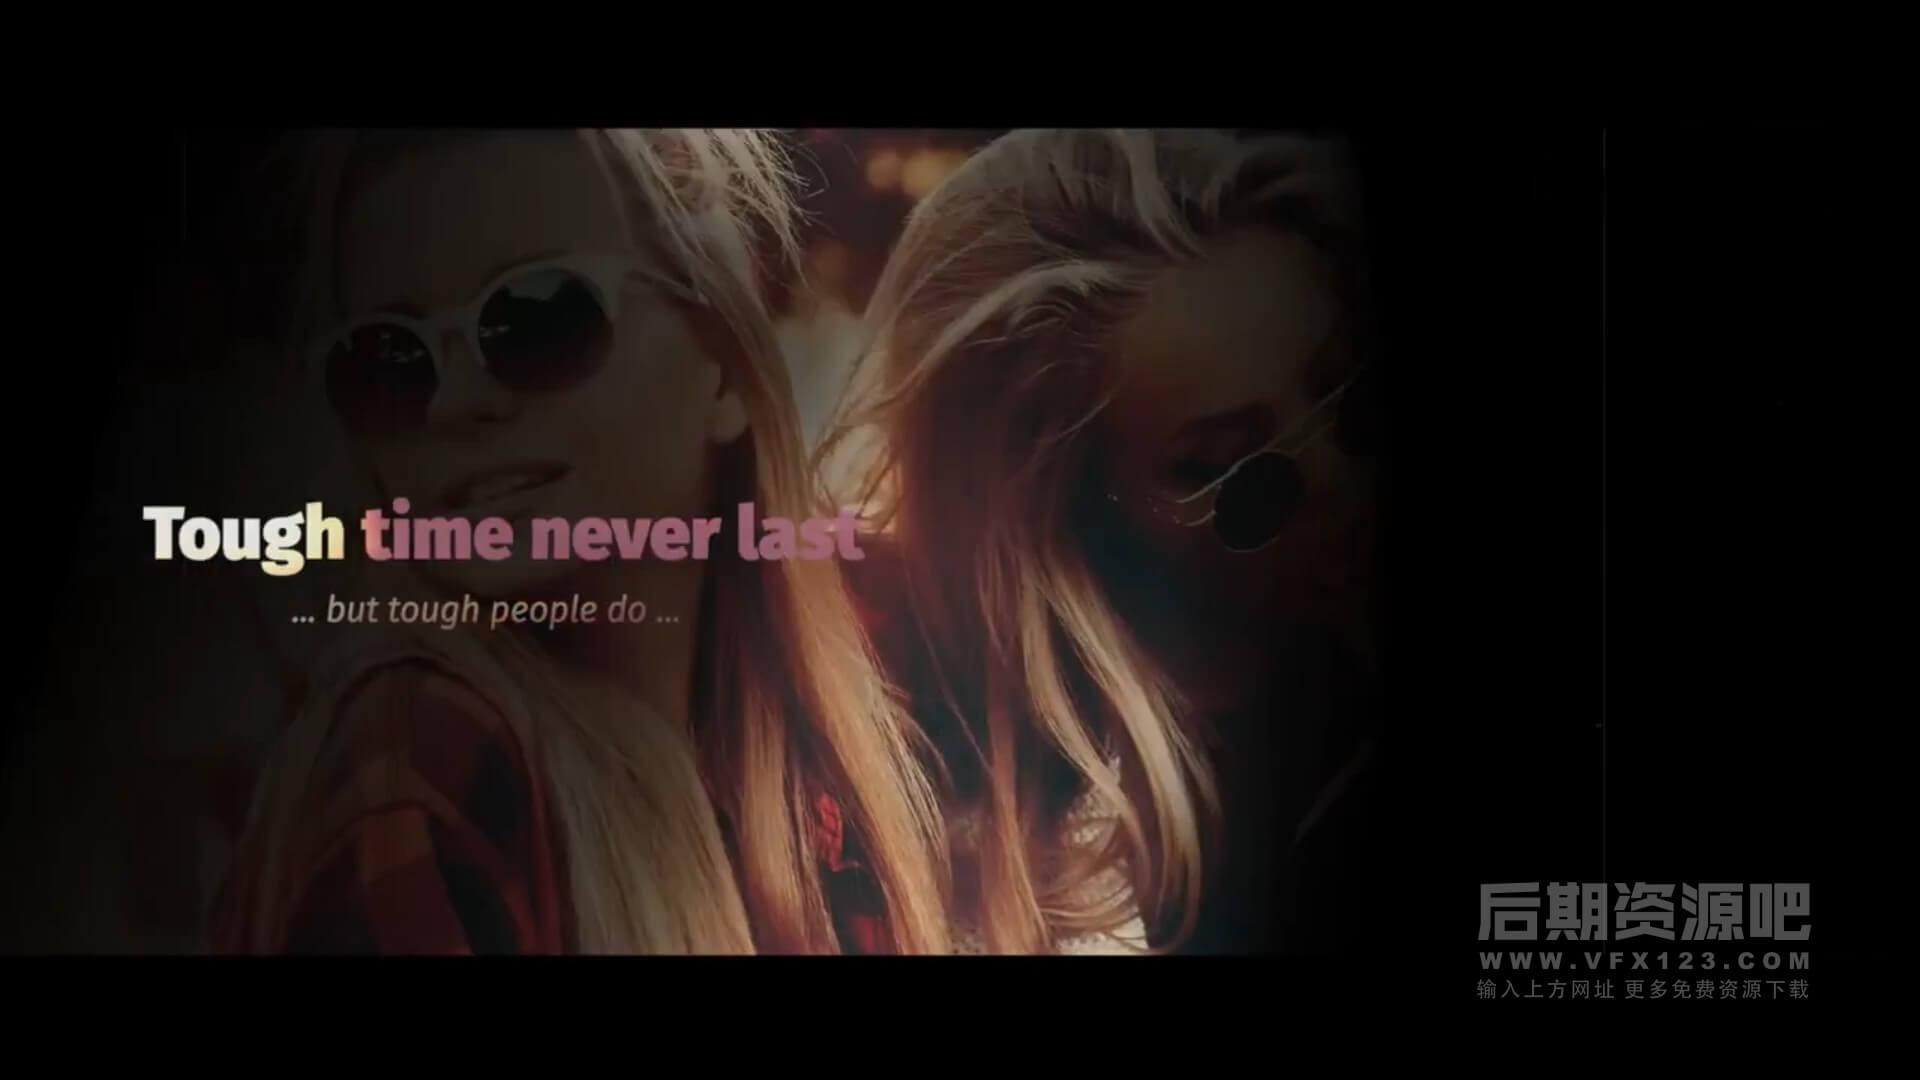 Fcpx主题模板 温馨柔和回忆录纪念册幻灯片模板 Emotional Memory